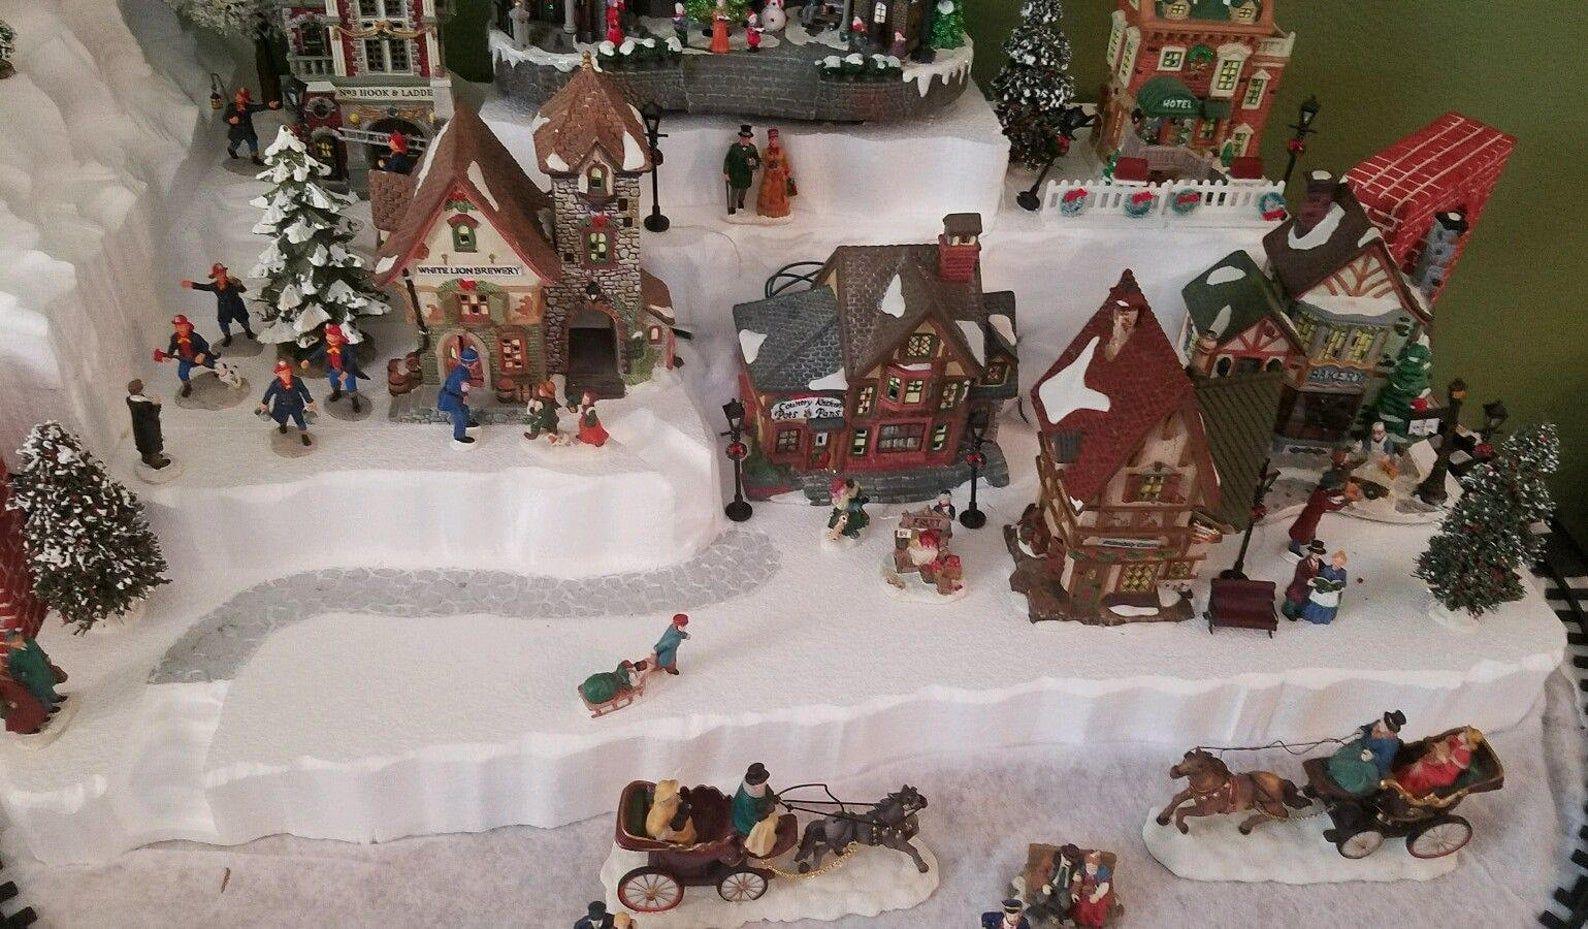 Christmas Village Display Platform for Lemax, Dept 56, Dickens, North Pole, Snow Village